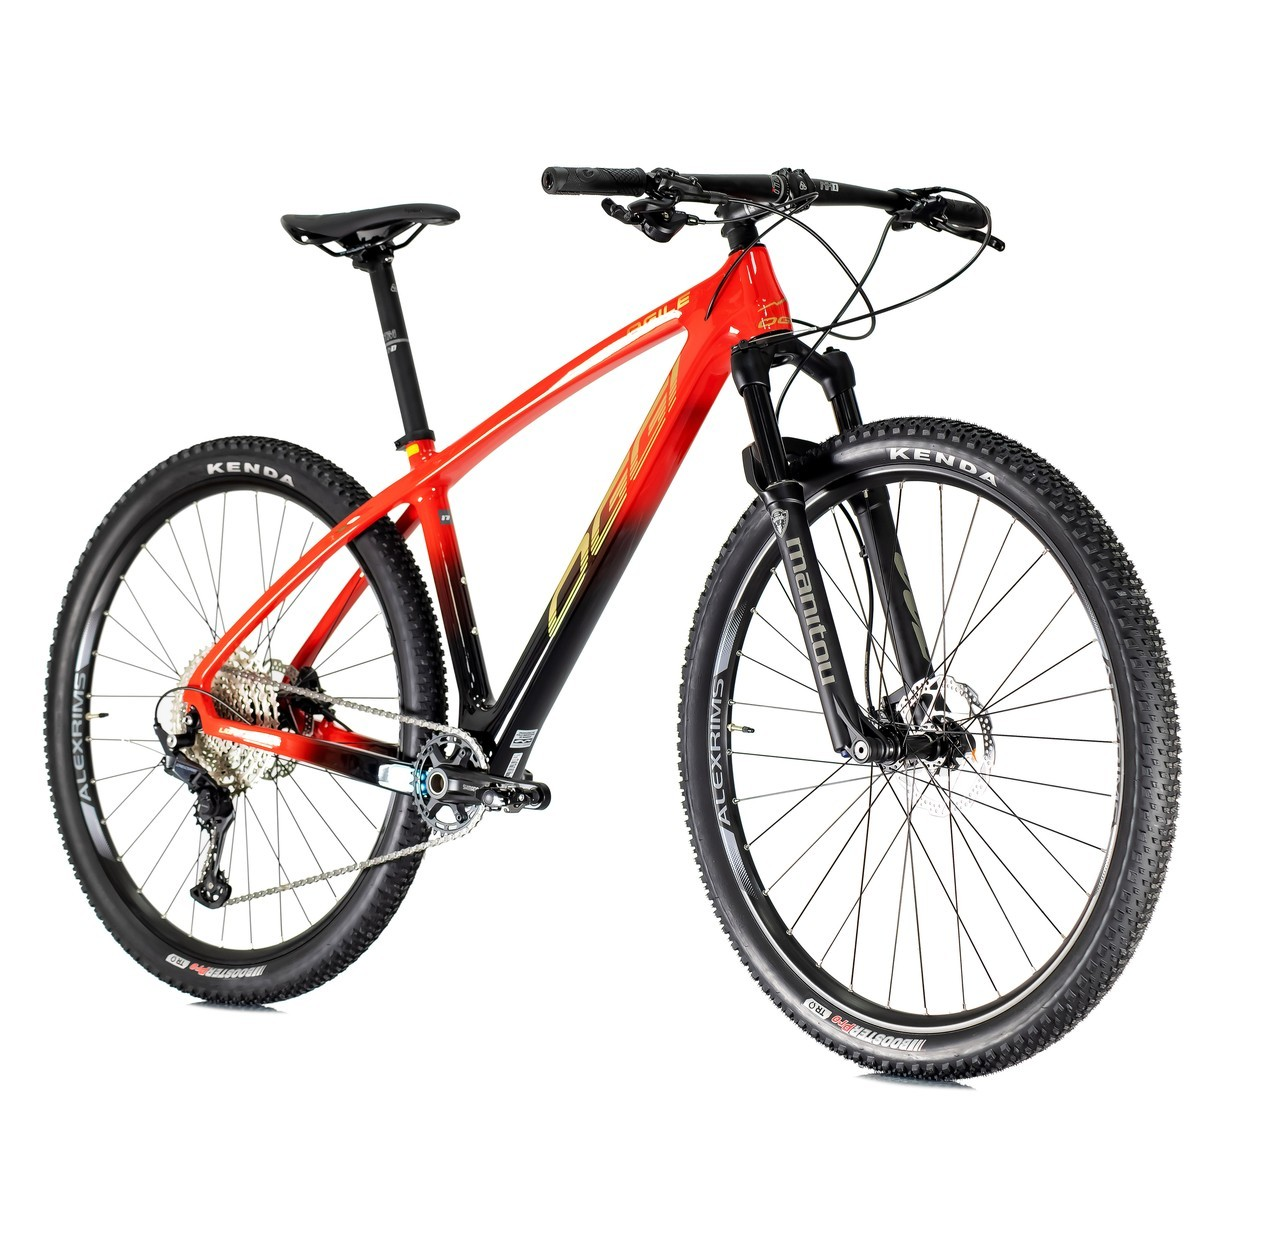 Bicicleta Oggi 29 Agile Sport Deore 12V Vm/Pto Tamanho 17 2021